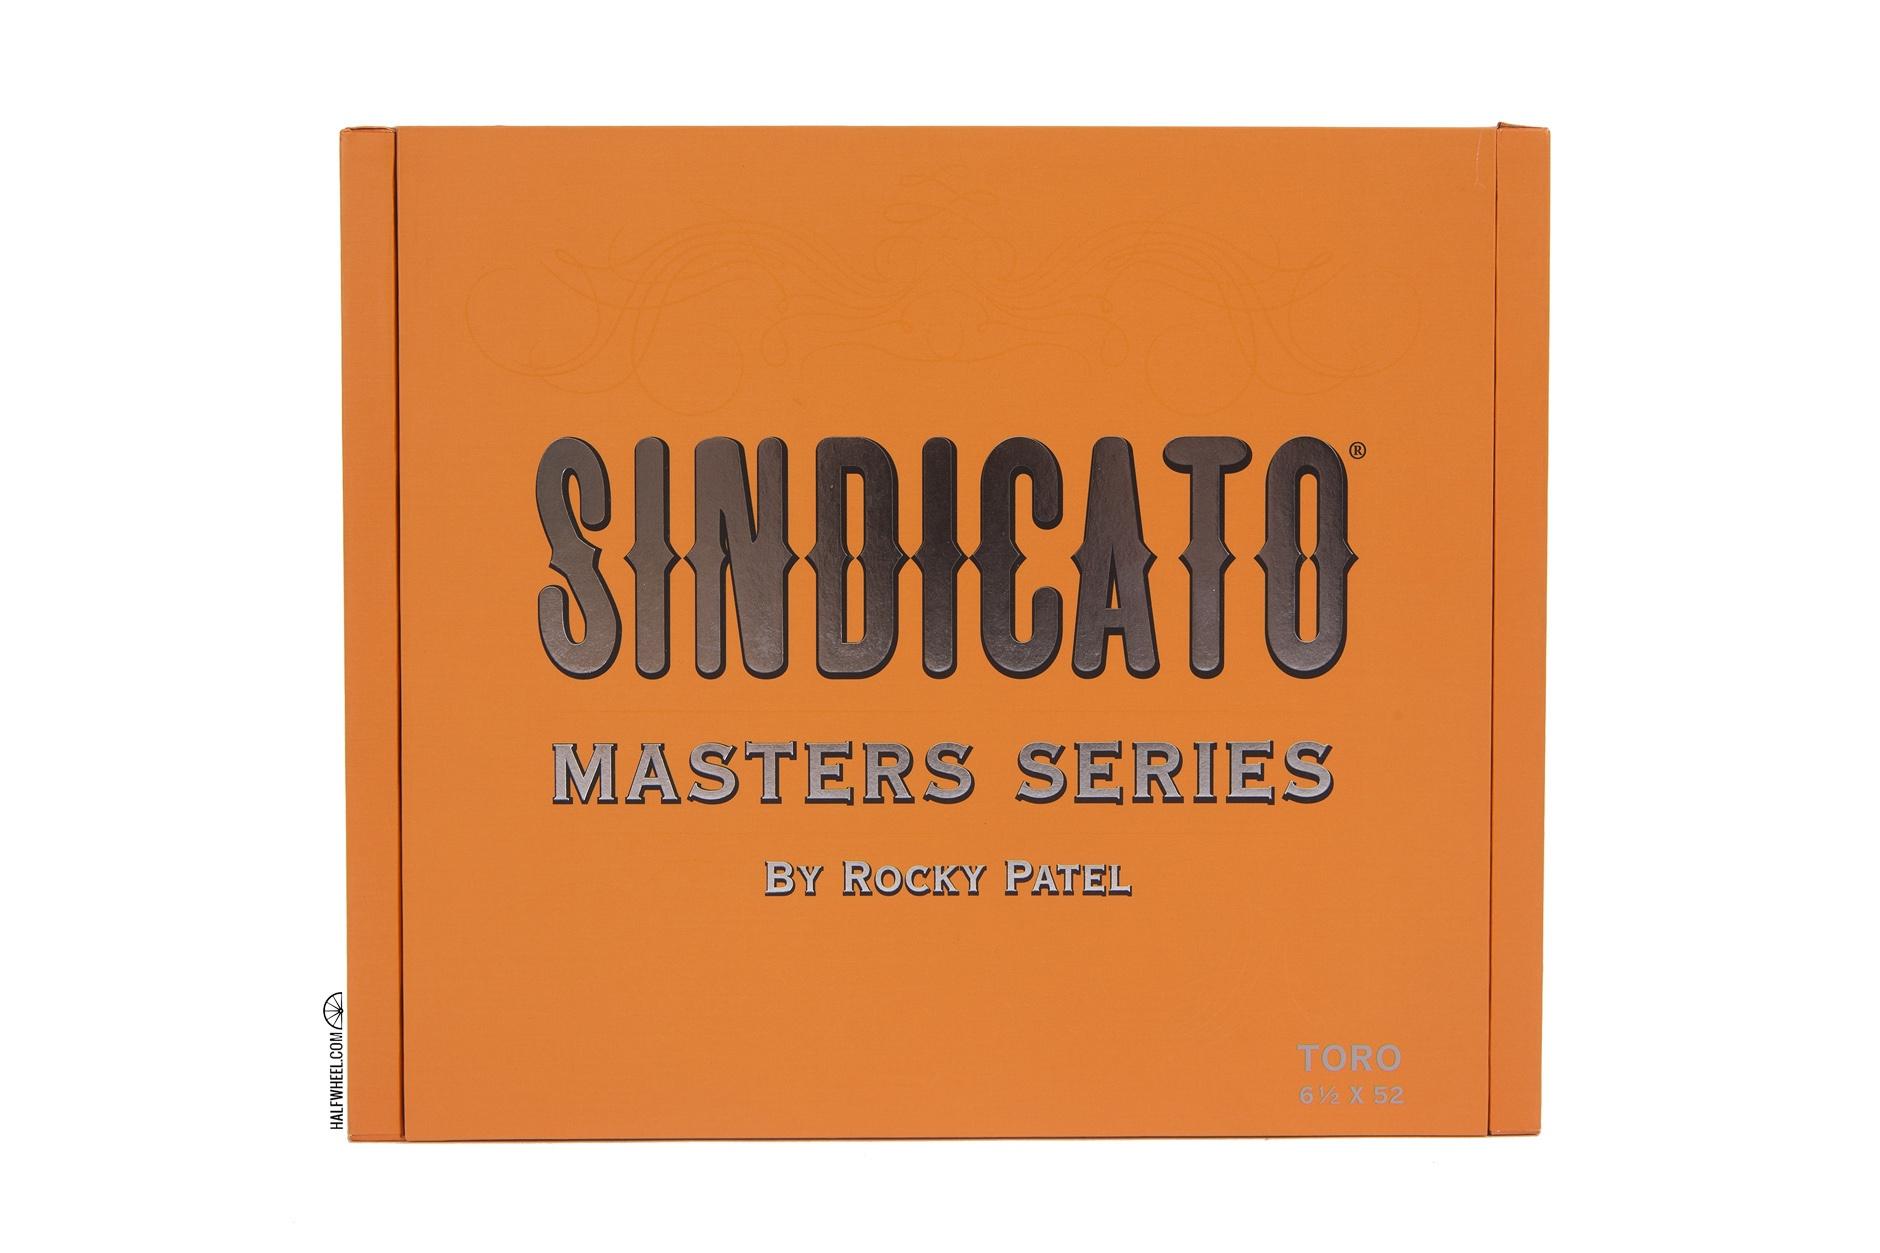 sindicato-masters-series-by-rocky-patel-toro-box-1